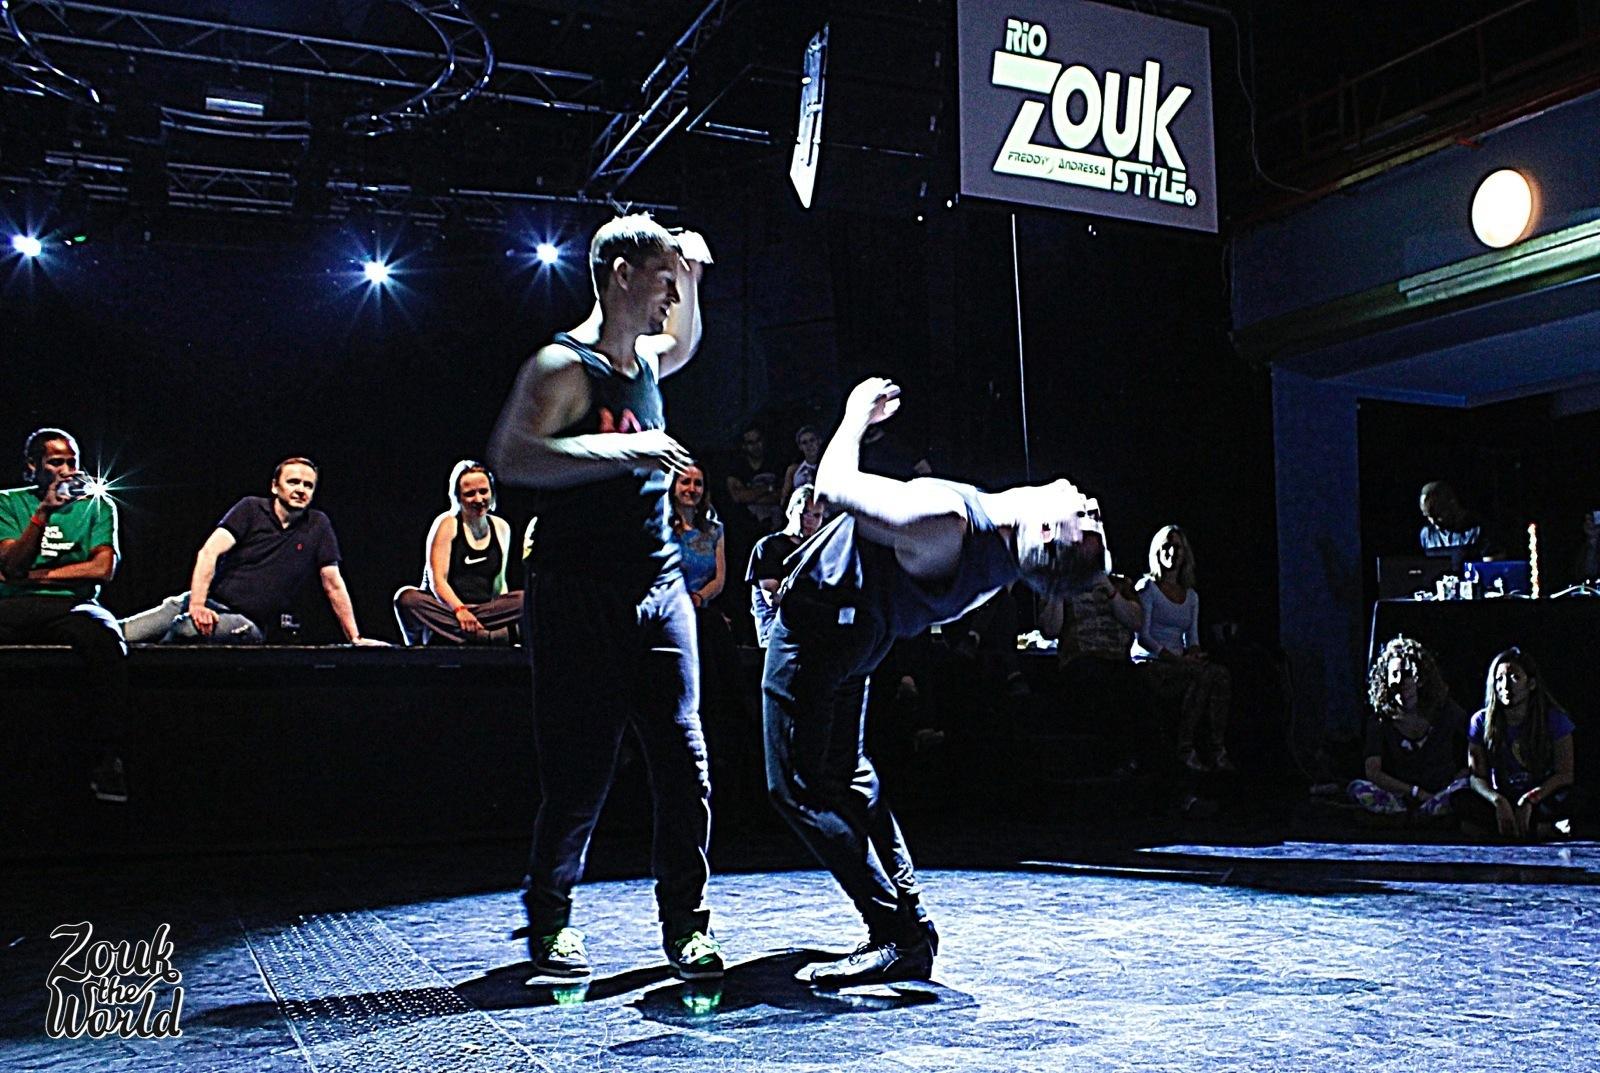 Mzouk Demo by Daniel and Ossi